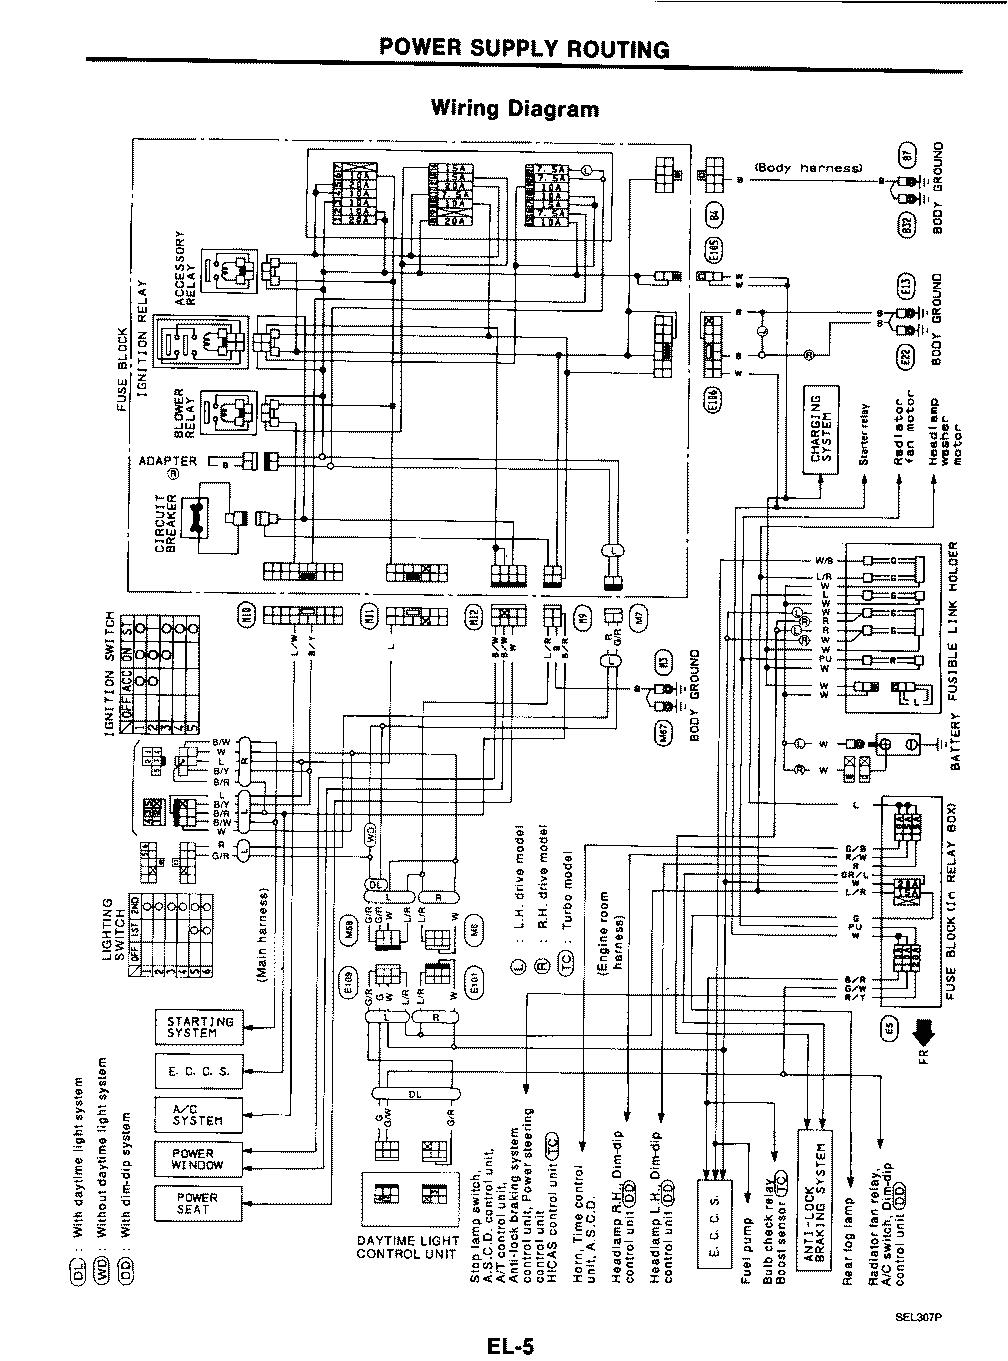 1993 Nissan 240sx Wiring Diagram 89 240sx Fuse Box Pinout Blog Wiring Diagram